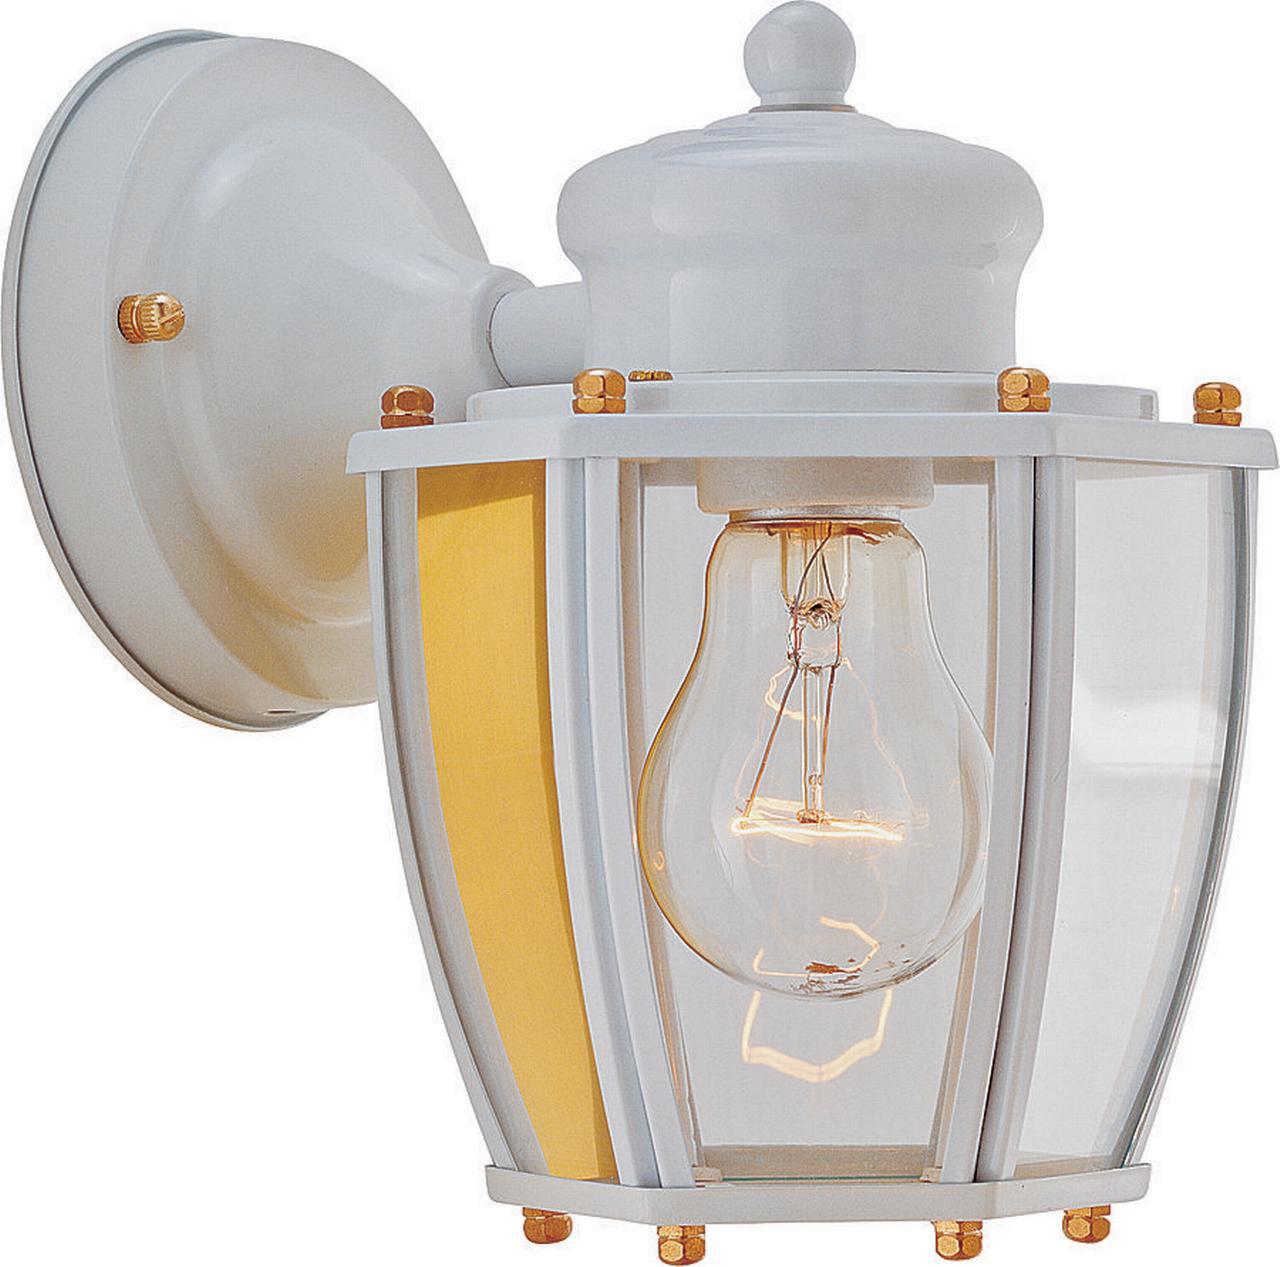 Boston Harbor Dimmable Outdoor Lantern, (1) 60/13 W Medium A19/Cfl Lamp, White